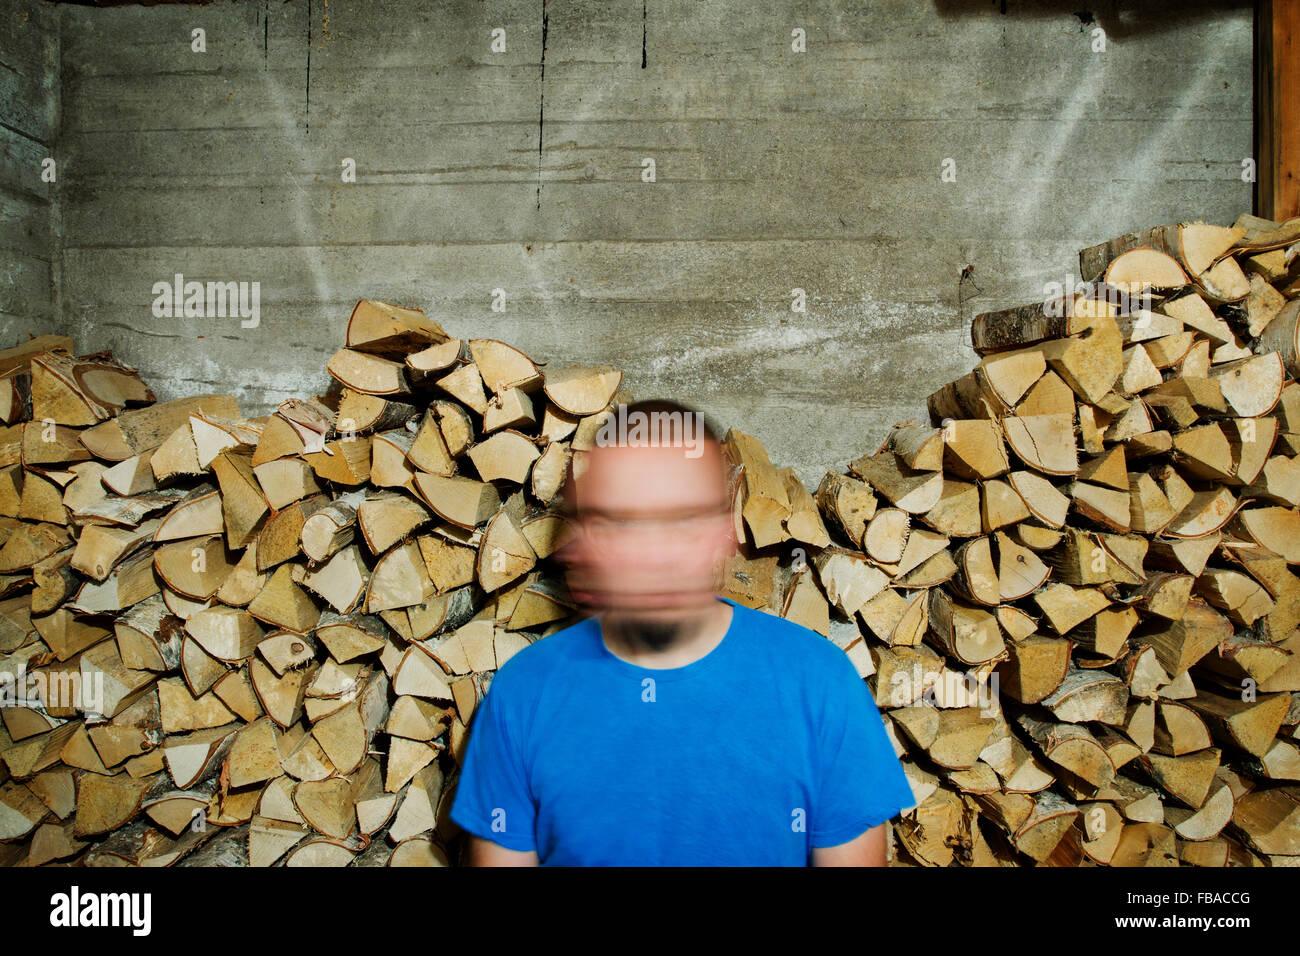 La Finlande, Heinola, Man with blurred face contre tas de bois Photo Stock